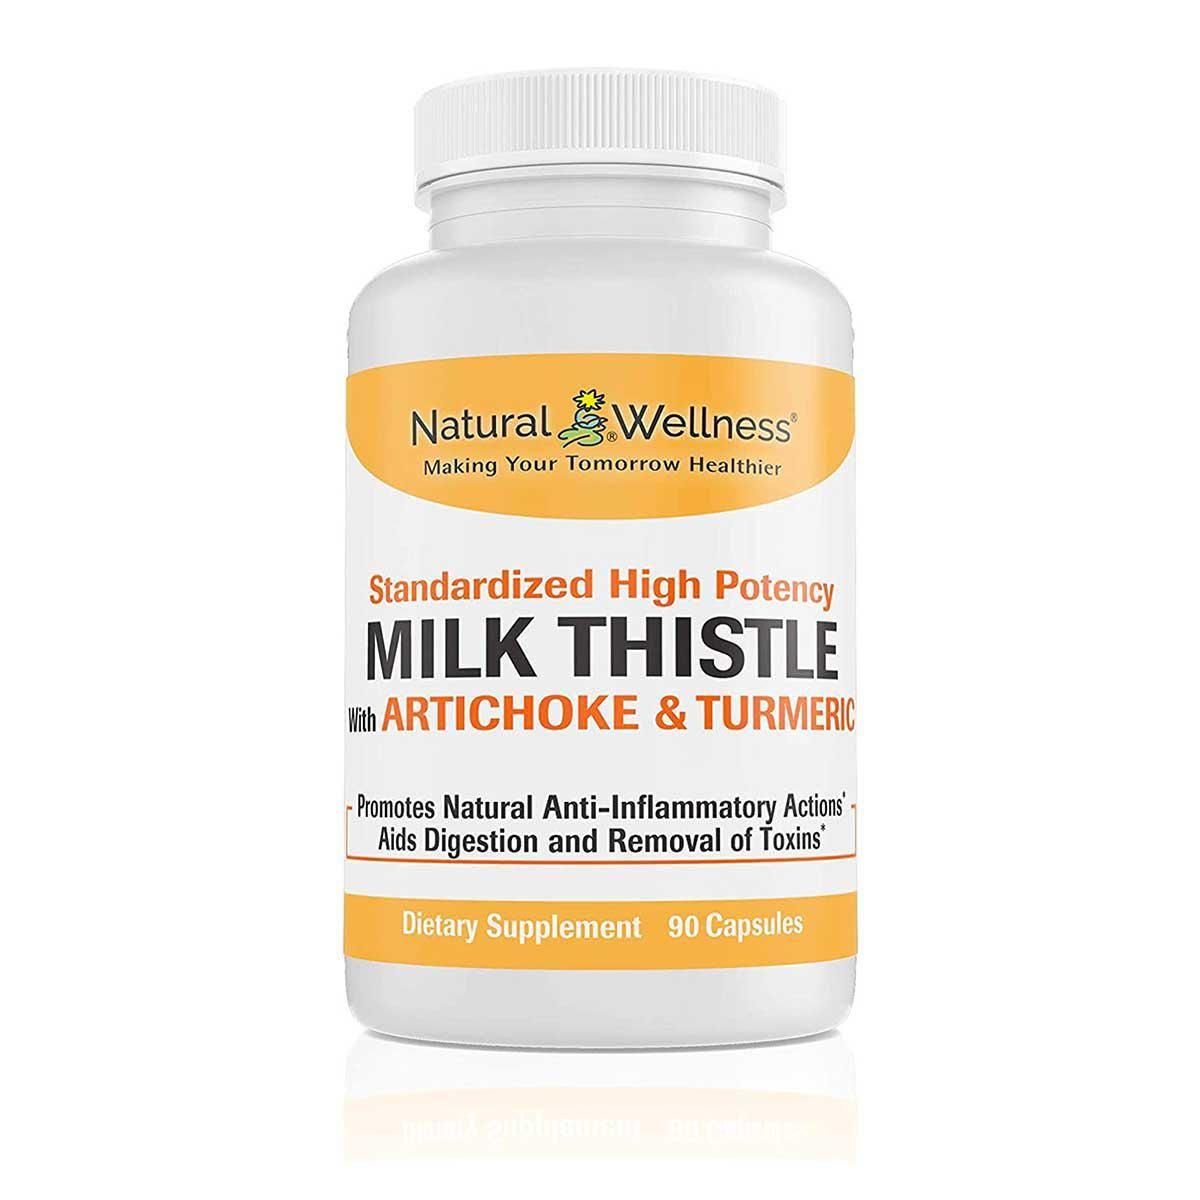 natural wellness milk thistle